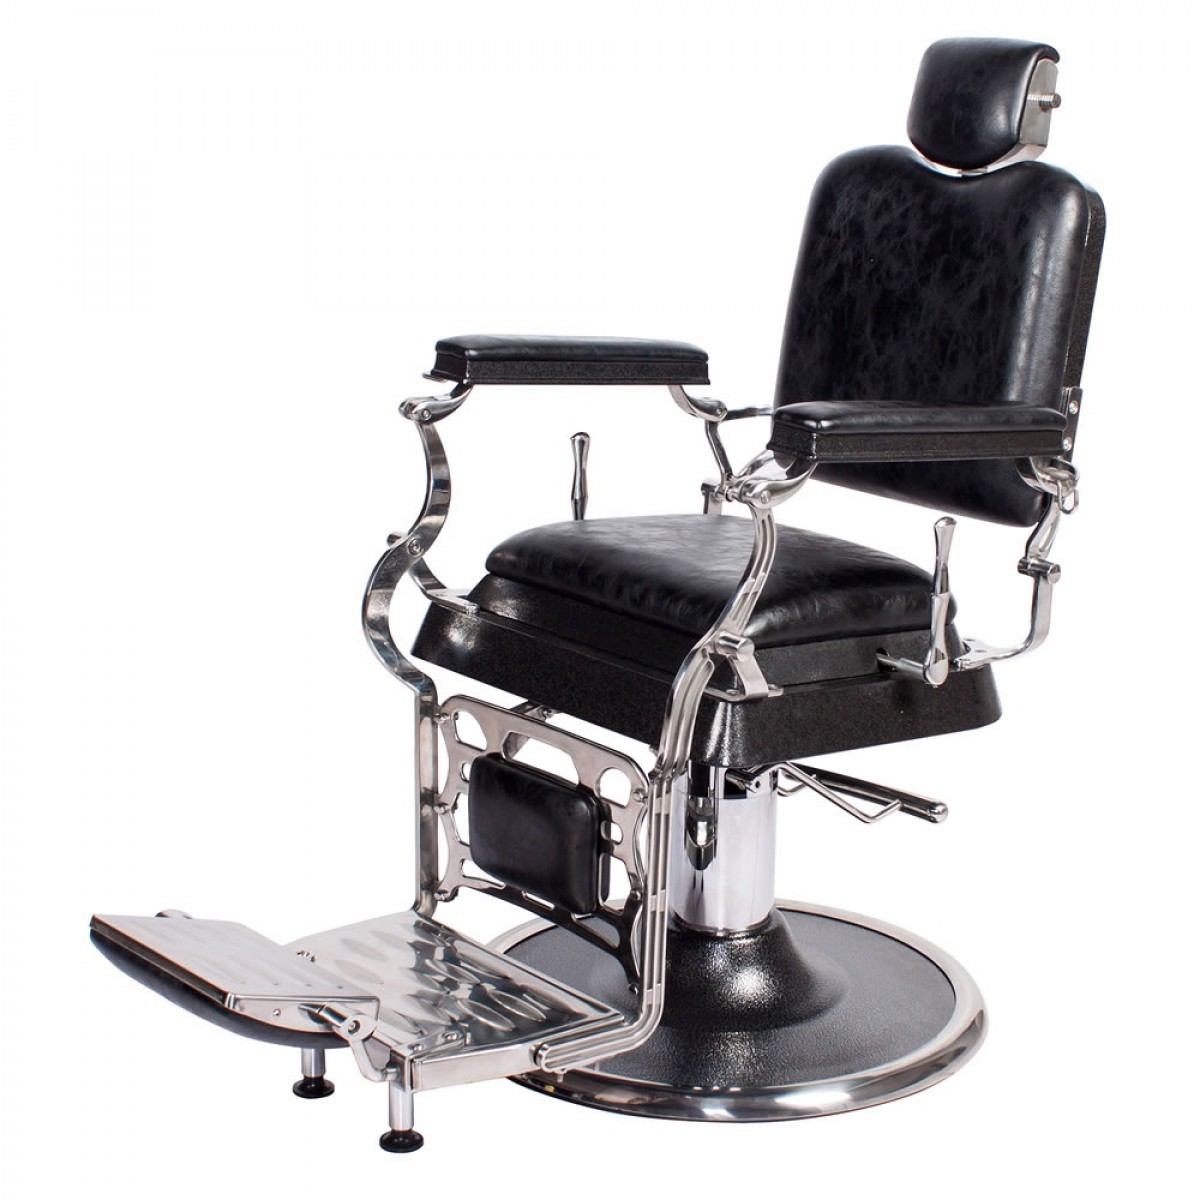 Old Barber Chairs >> Emperor Barber Chair In Antique Black Barber Shop Furniture